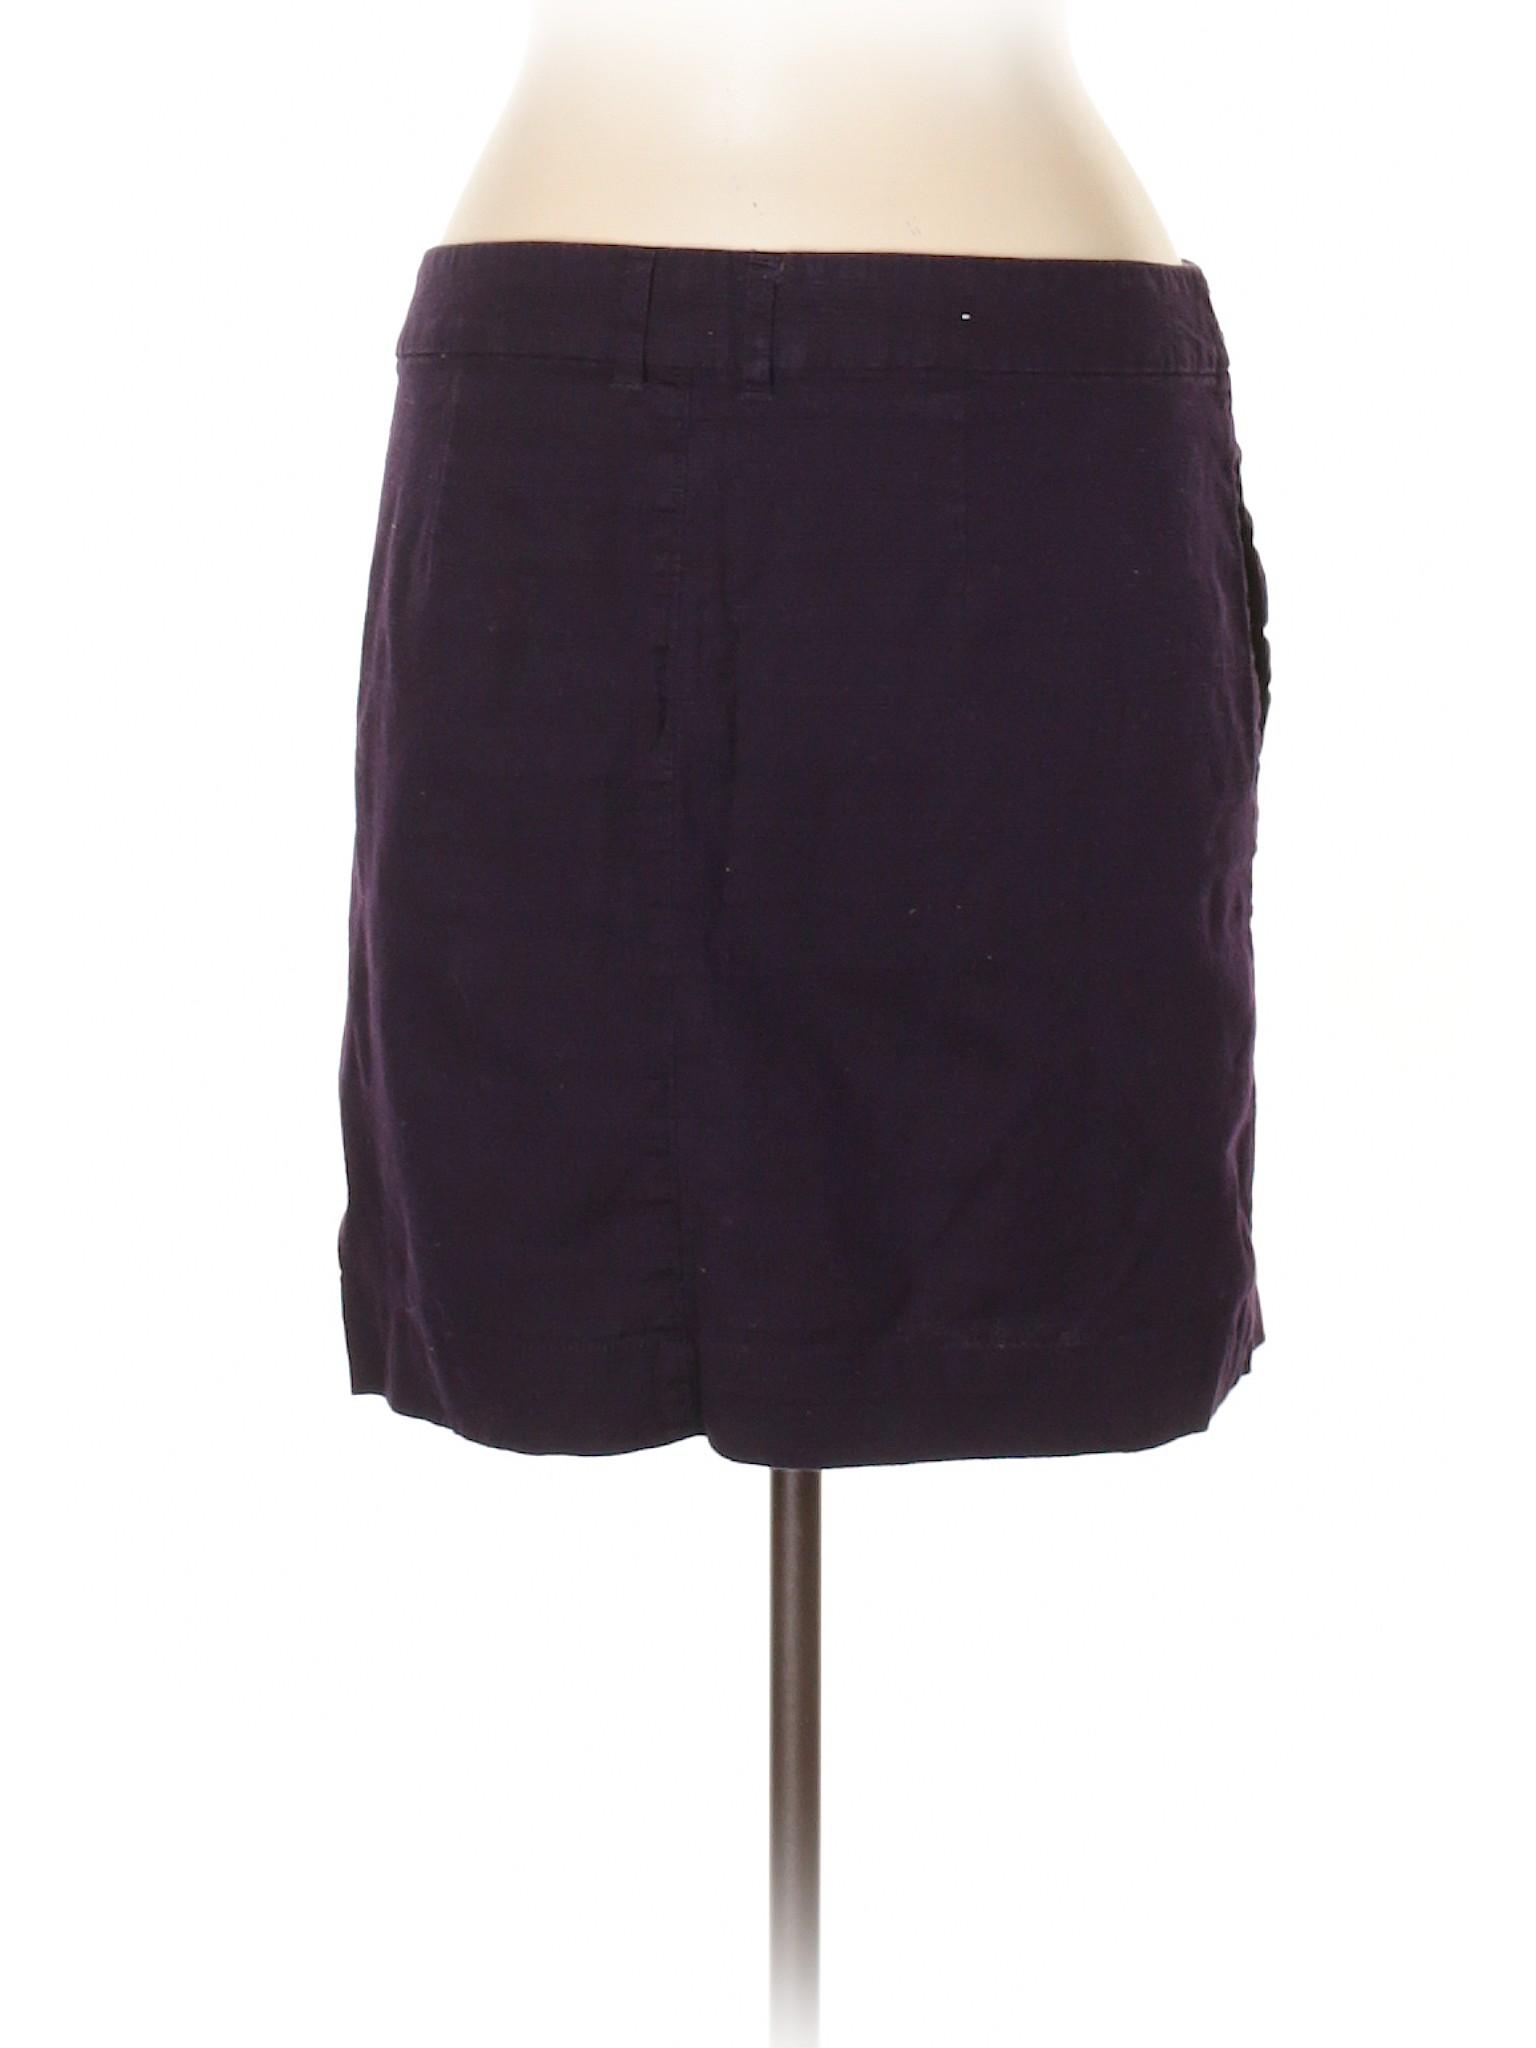 Casual Gap Boutique Gap Outlet Outlet Skirt Boutique Casual Skirt v5xXA